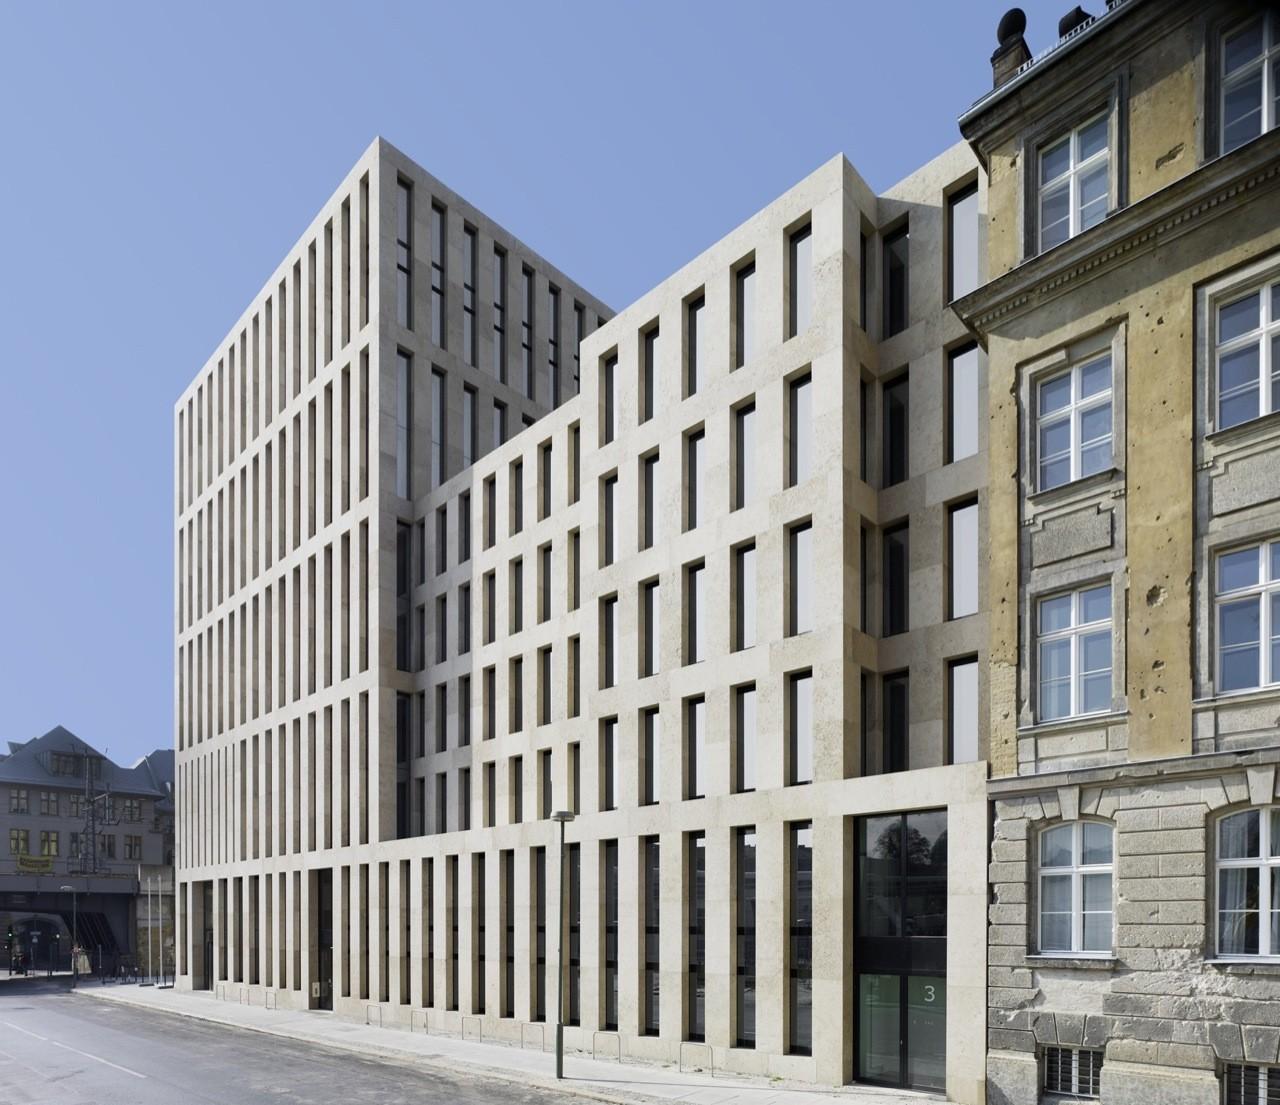 Jacob and wilhelm grimm centre max dudler archdaily - Architekt trier ...